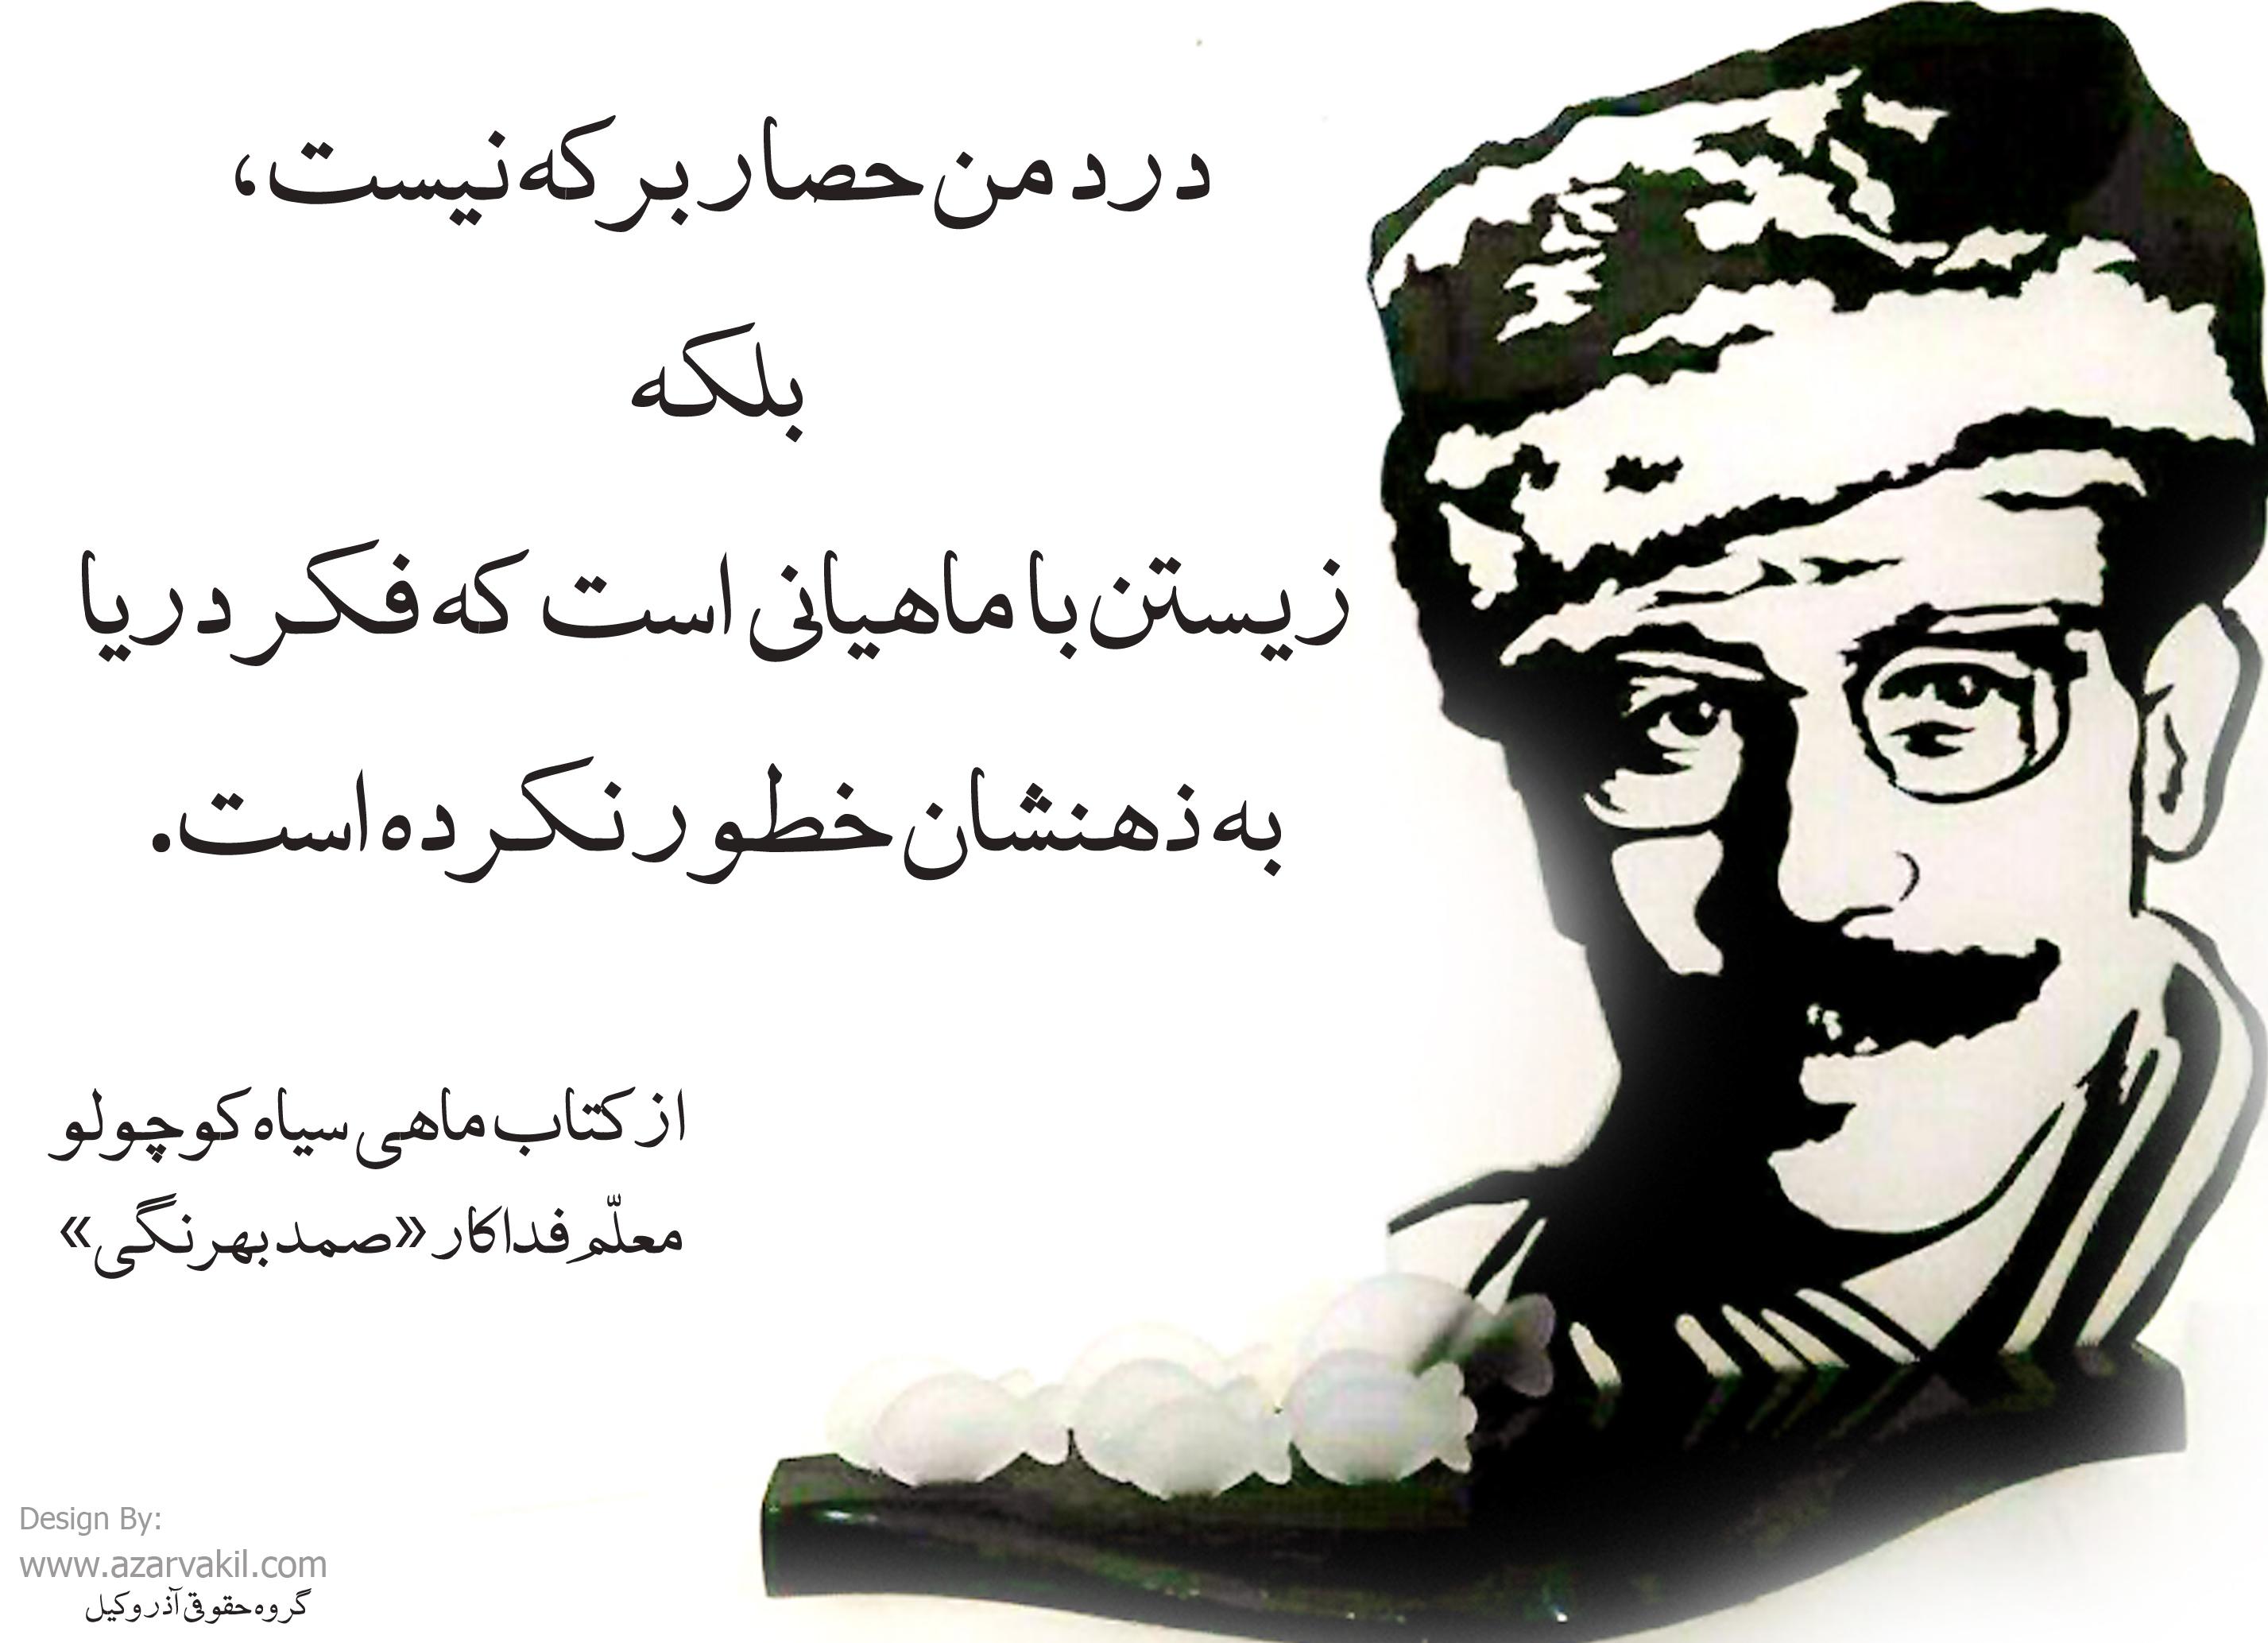 http://bayram.arzublog.com/uploads/bayram/behrangi_samsd_-_2.jpg